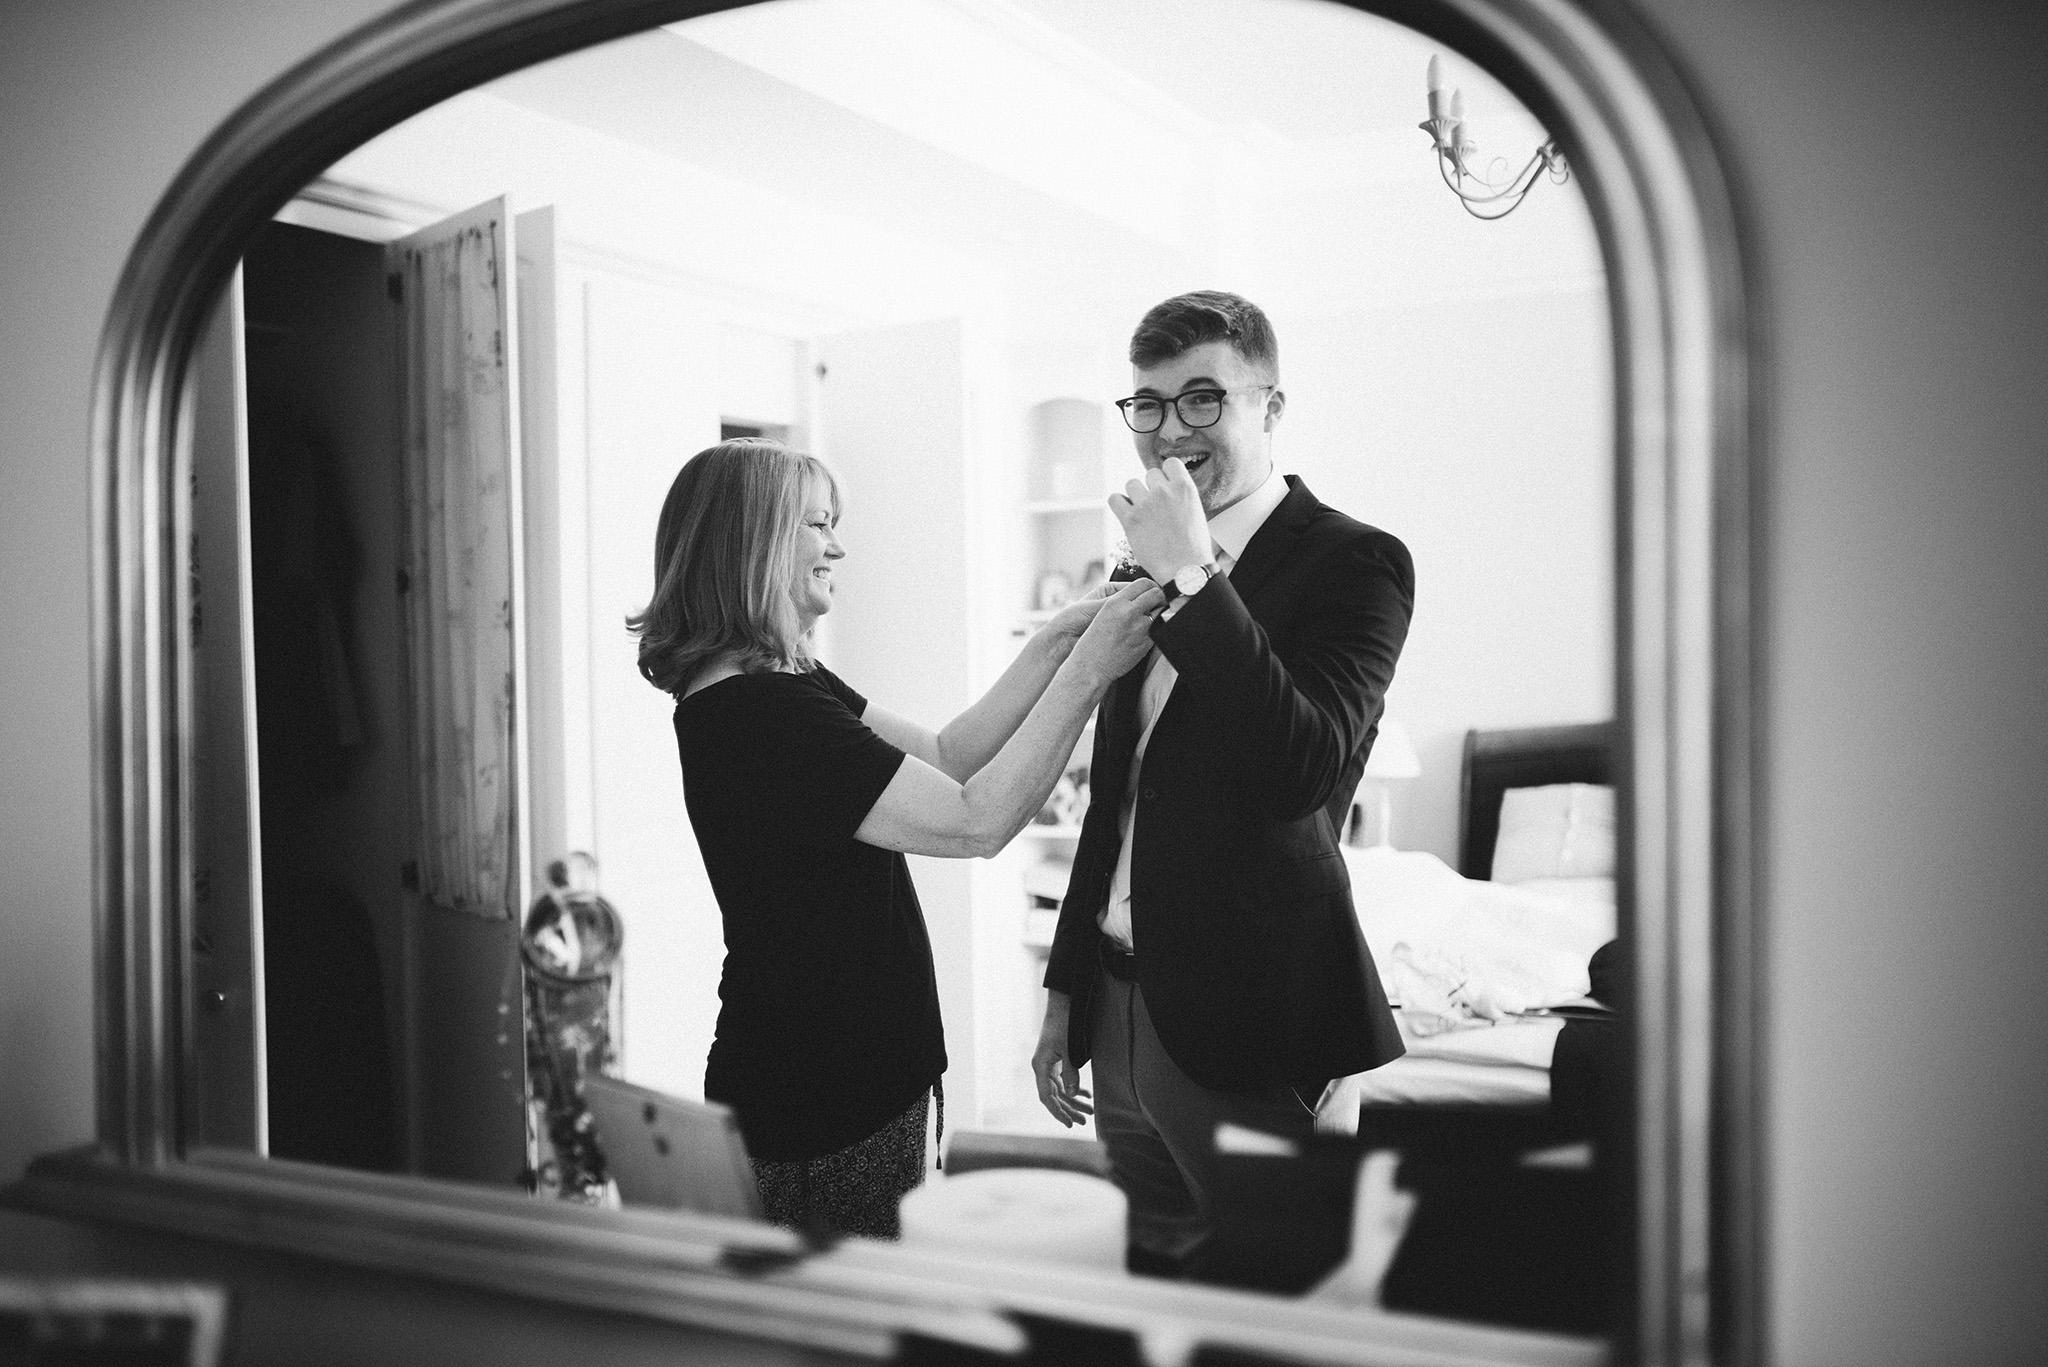 scott-stockwell-photography-wedding-41.jpg